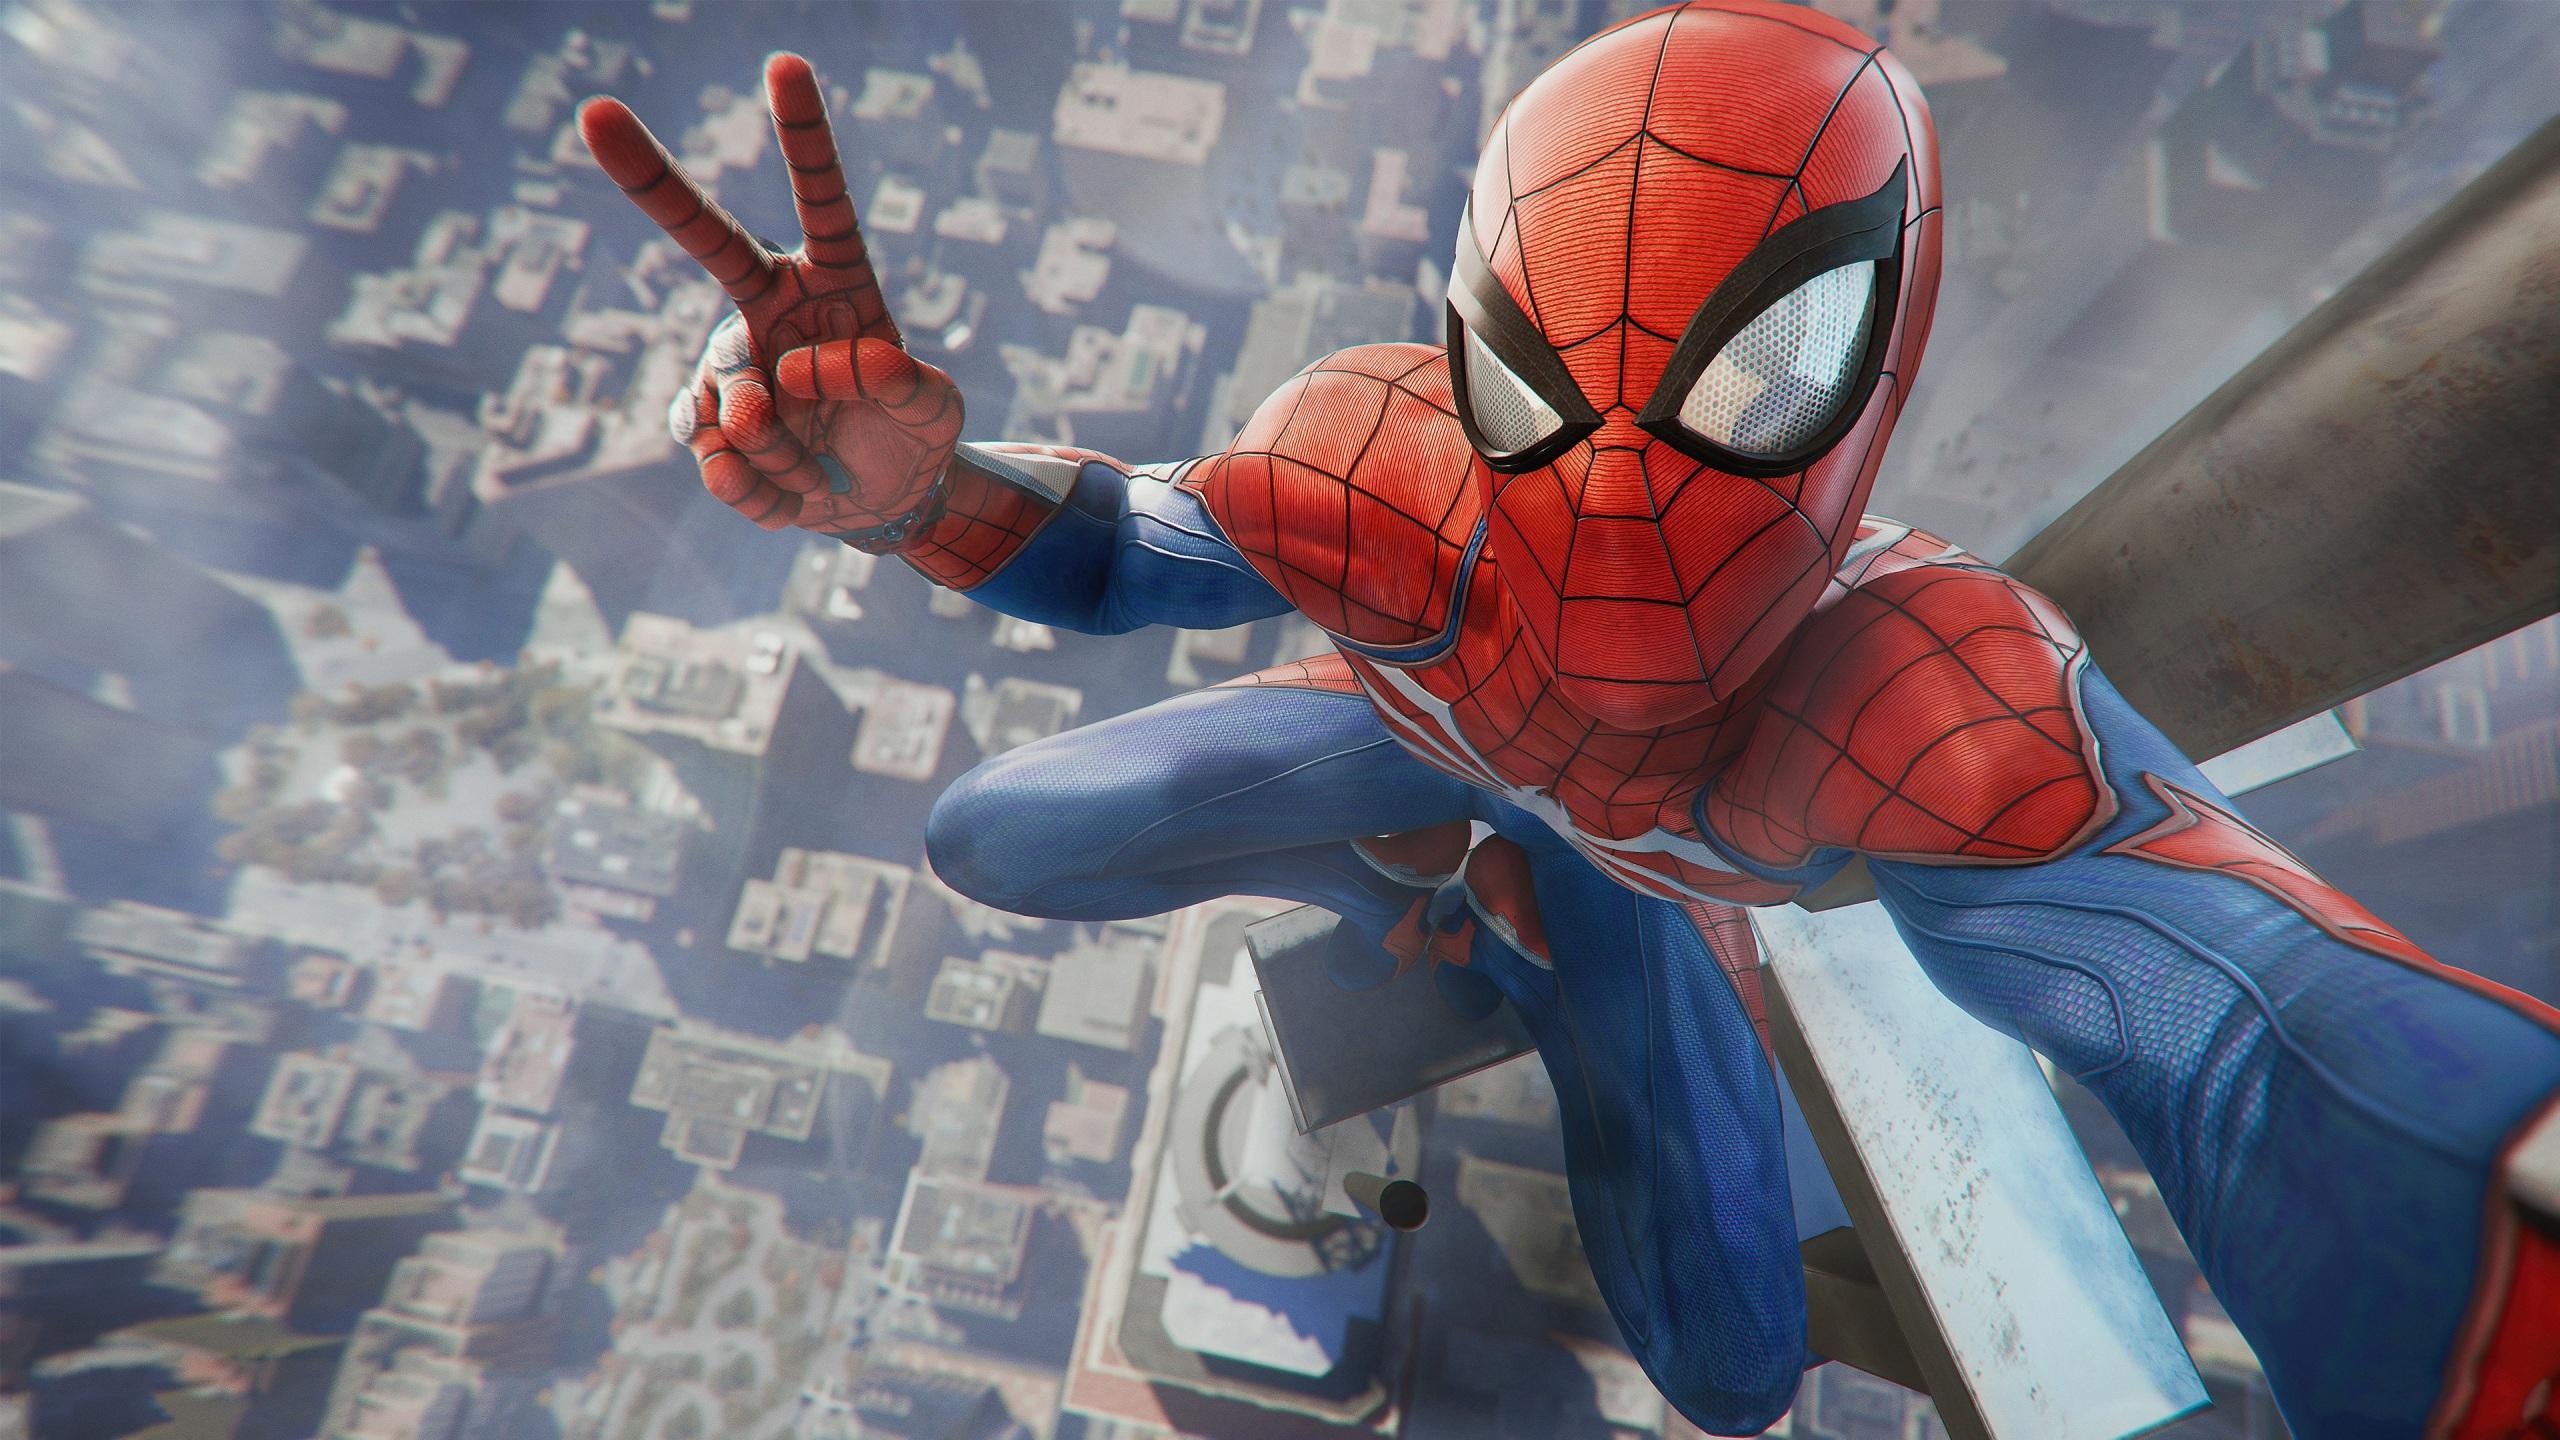 Image Spiderman Hero Fantasy 2560x1440